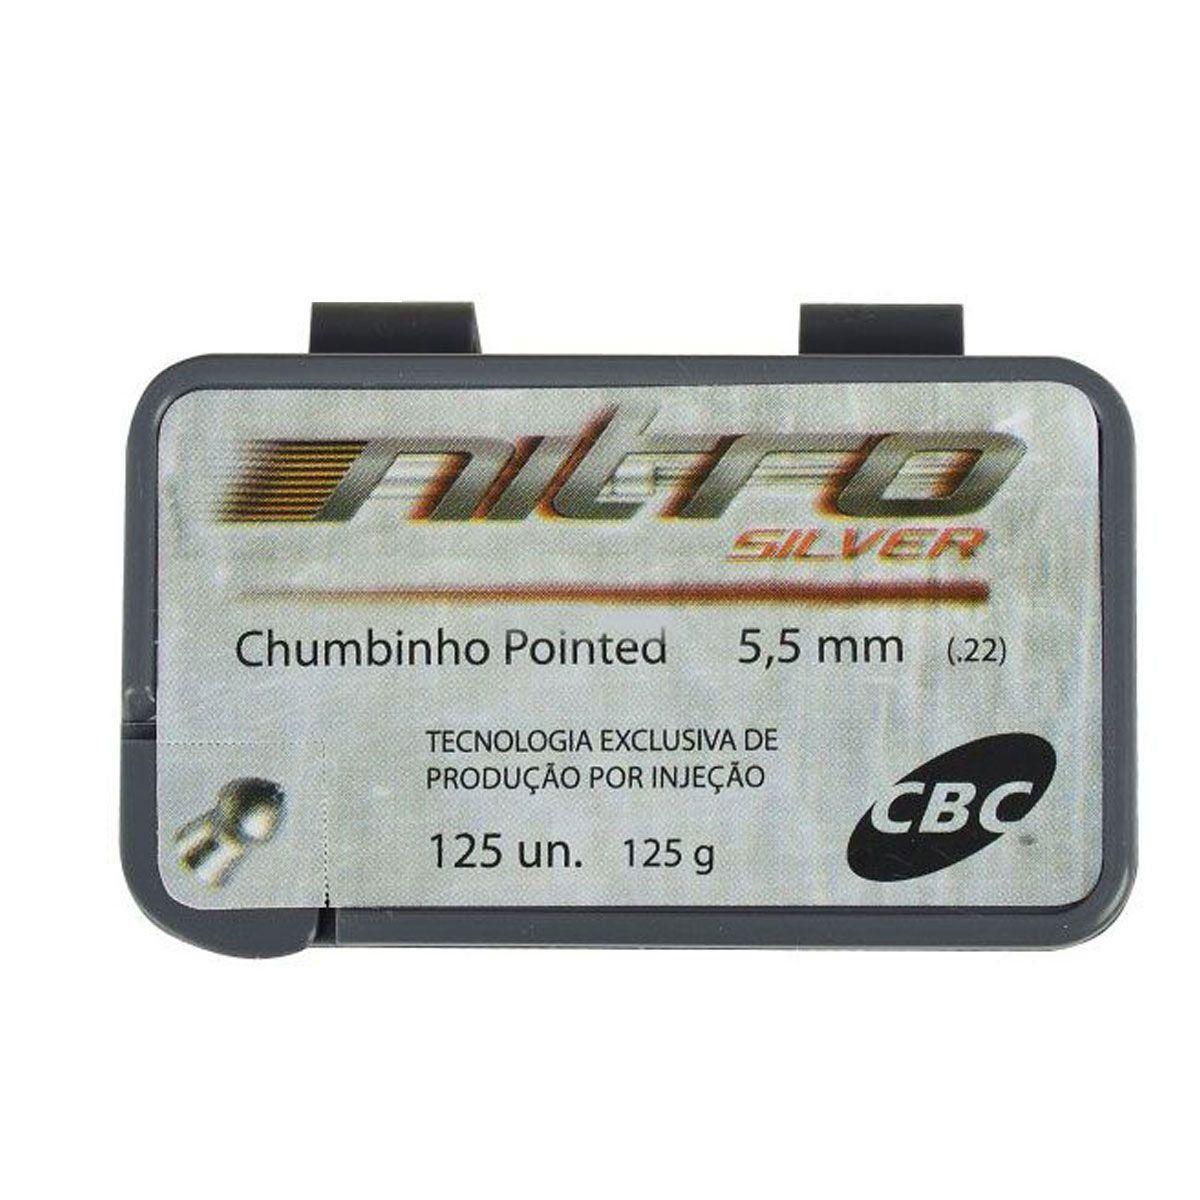 Chumbinho CBC 5,5 MM Pointed Nitro Silver